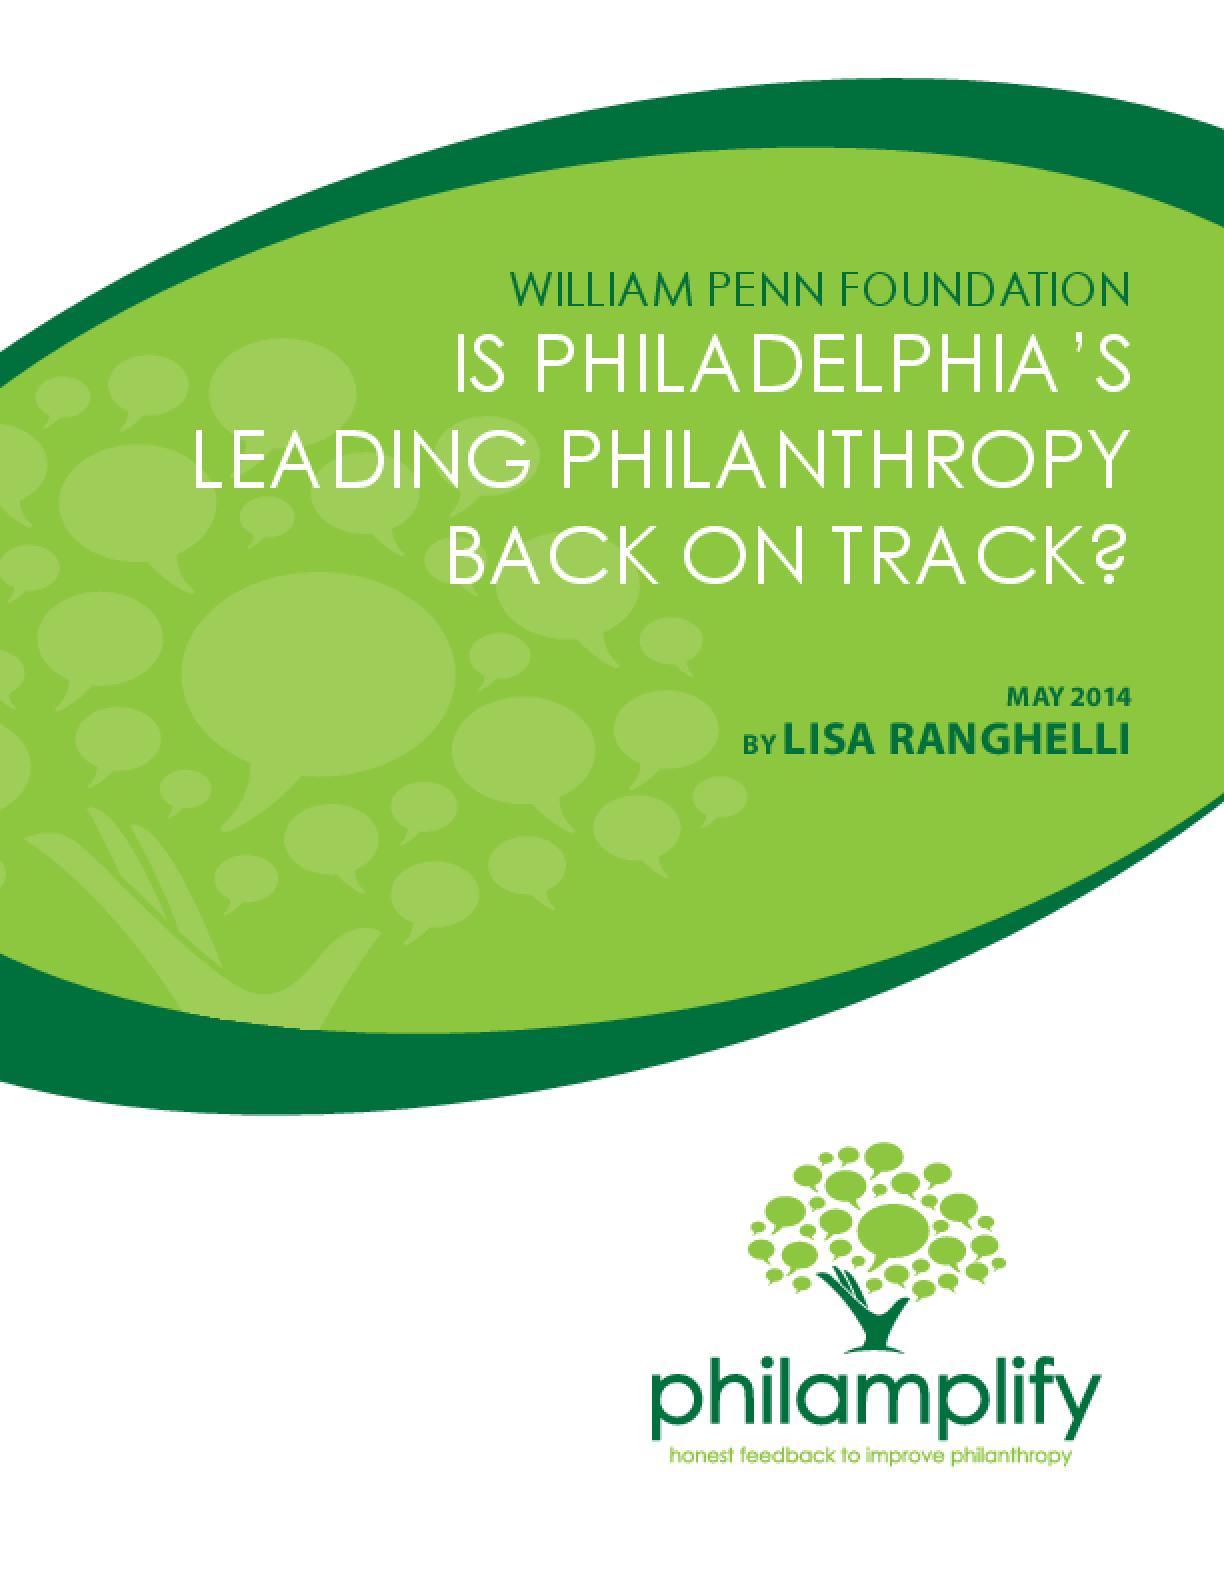 William Penn Foundation - Is Philadelphia's Leading Philanthropy Back on Track?